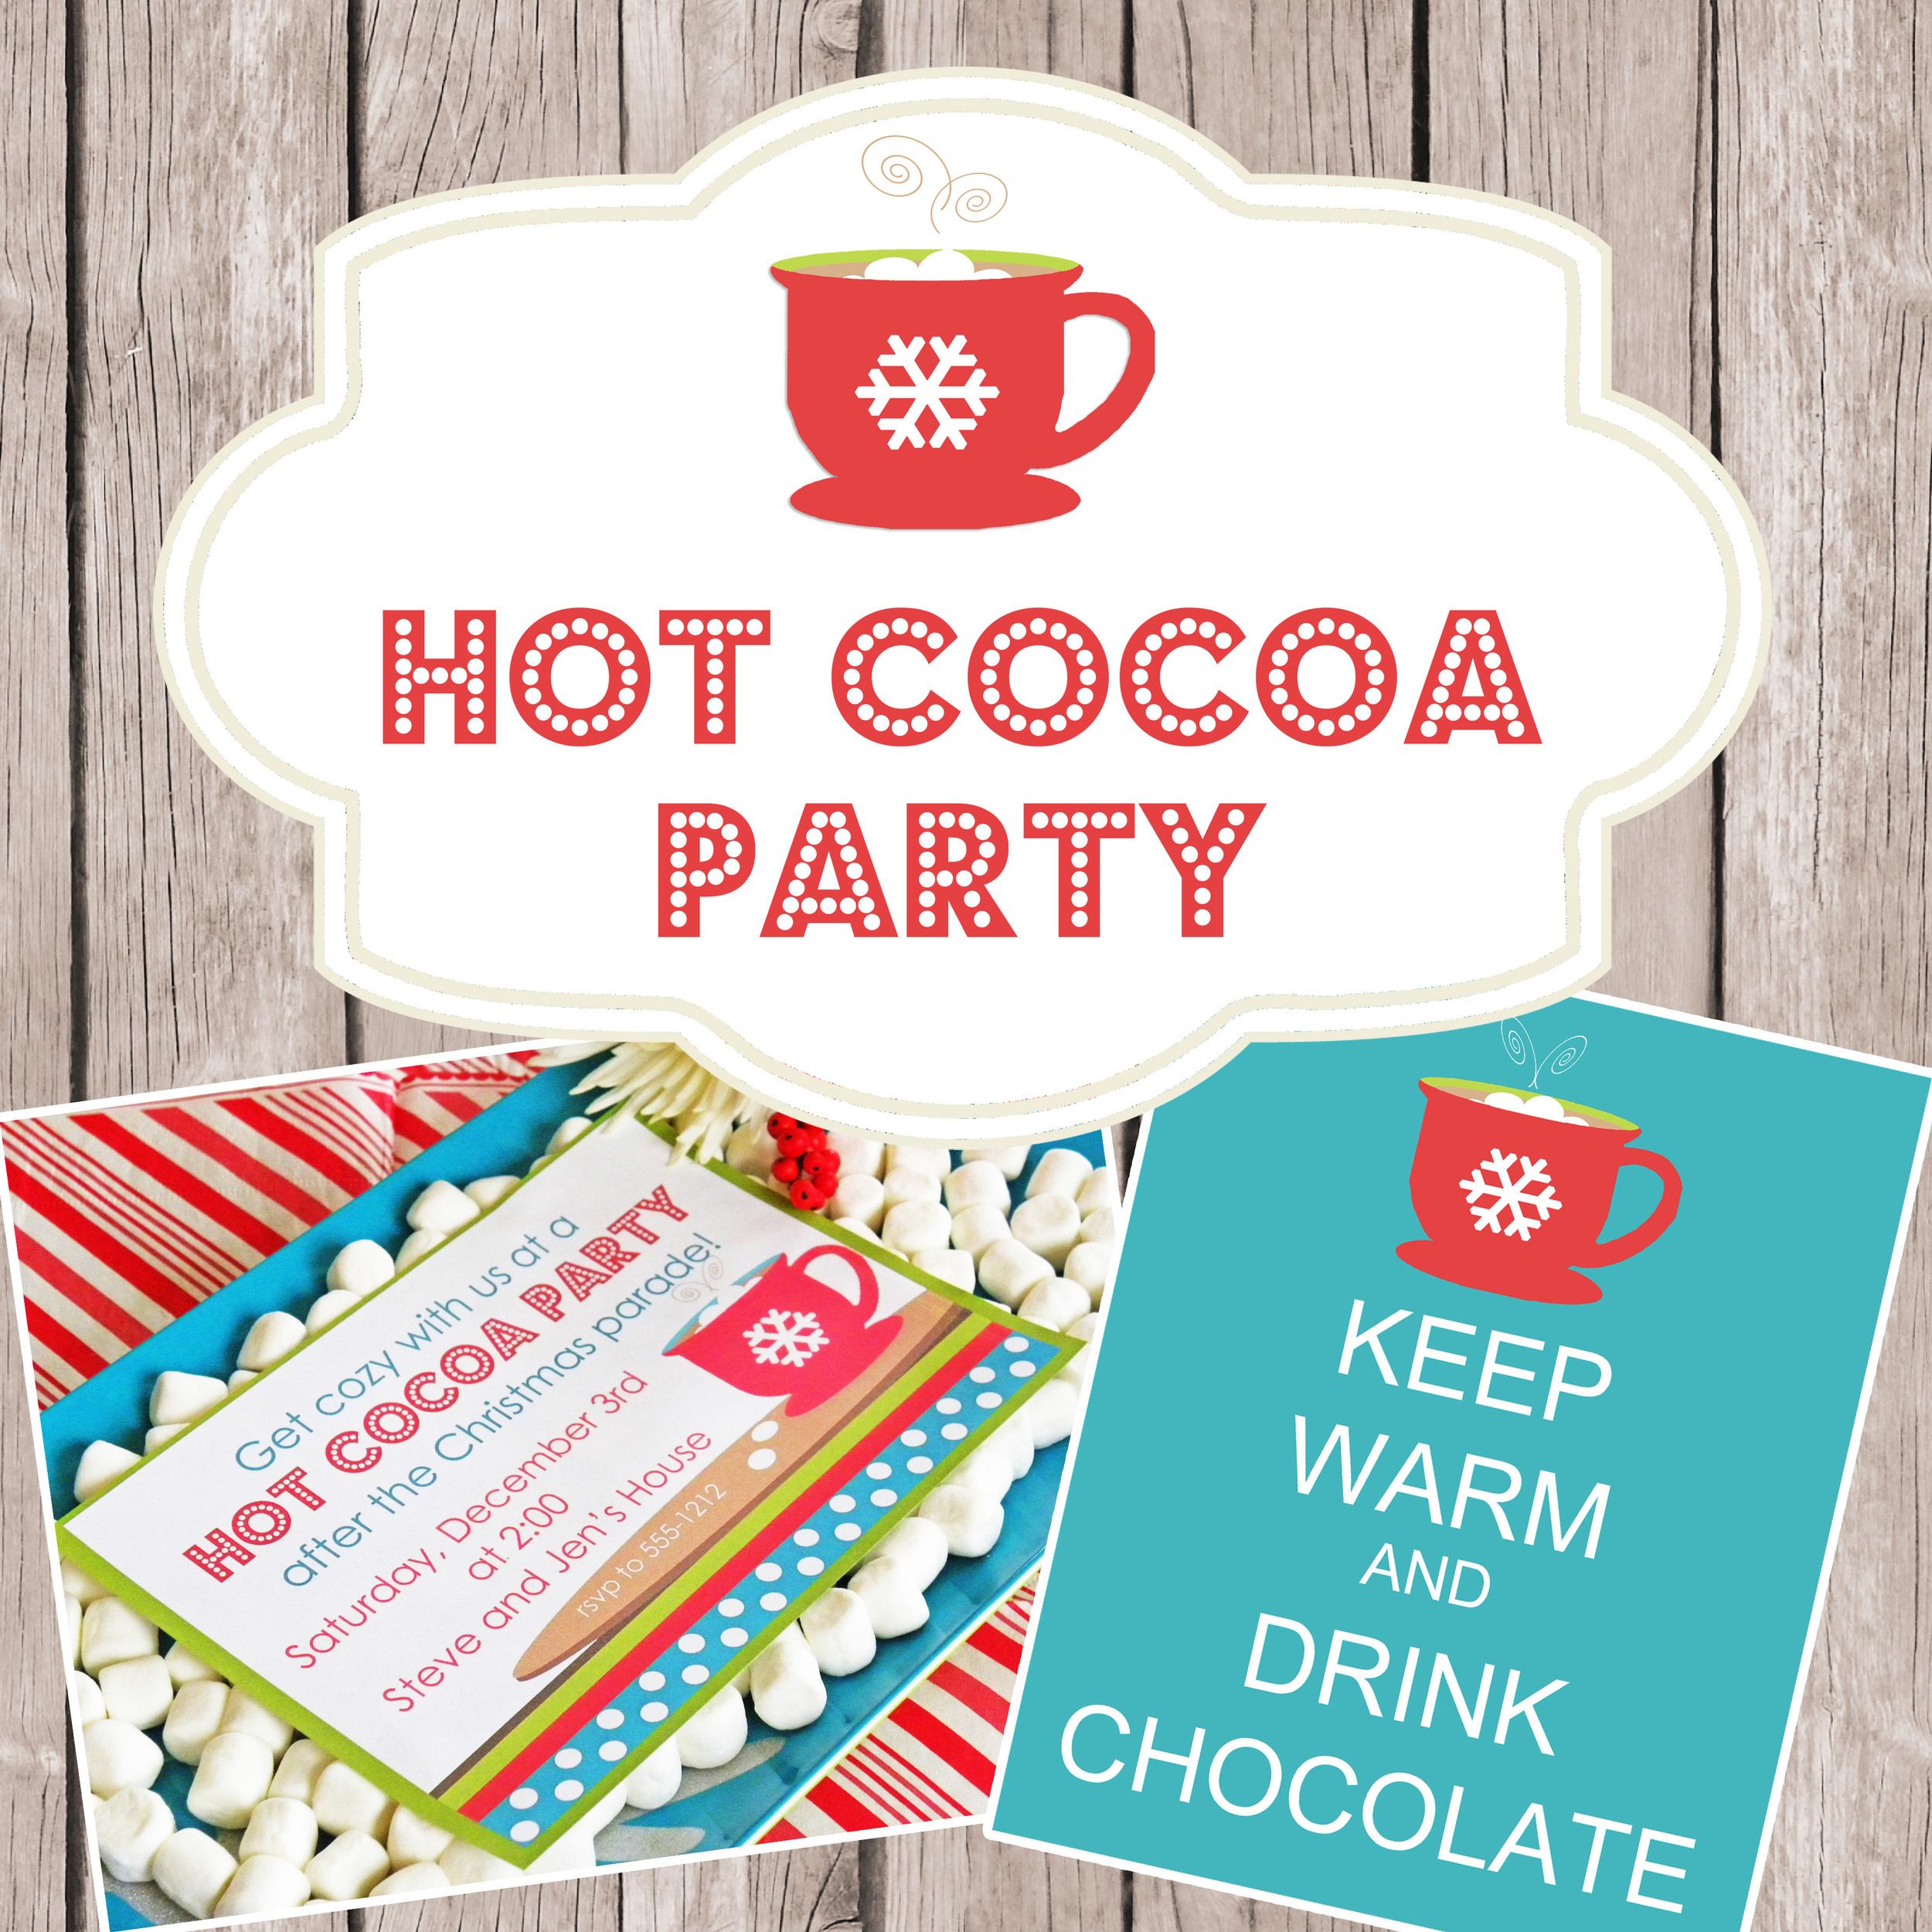 Hot Cocoa Cover copy.jpg